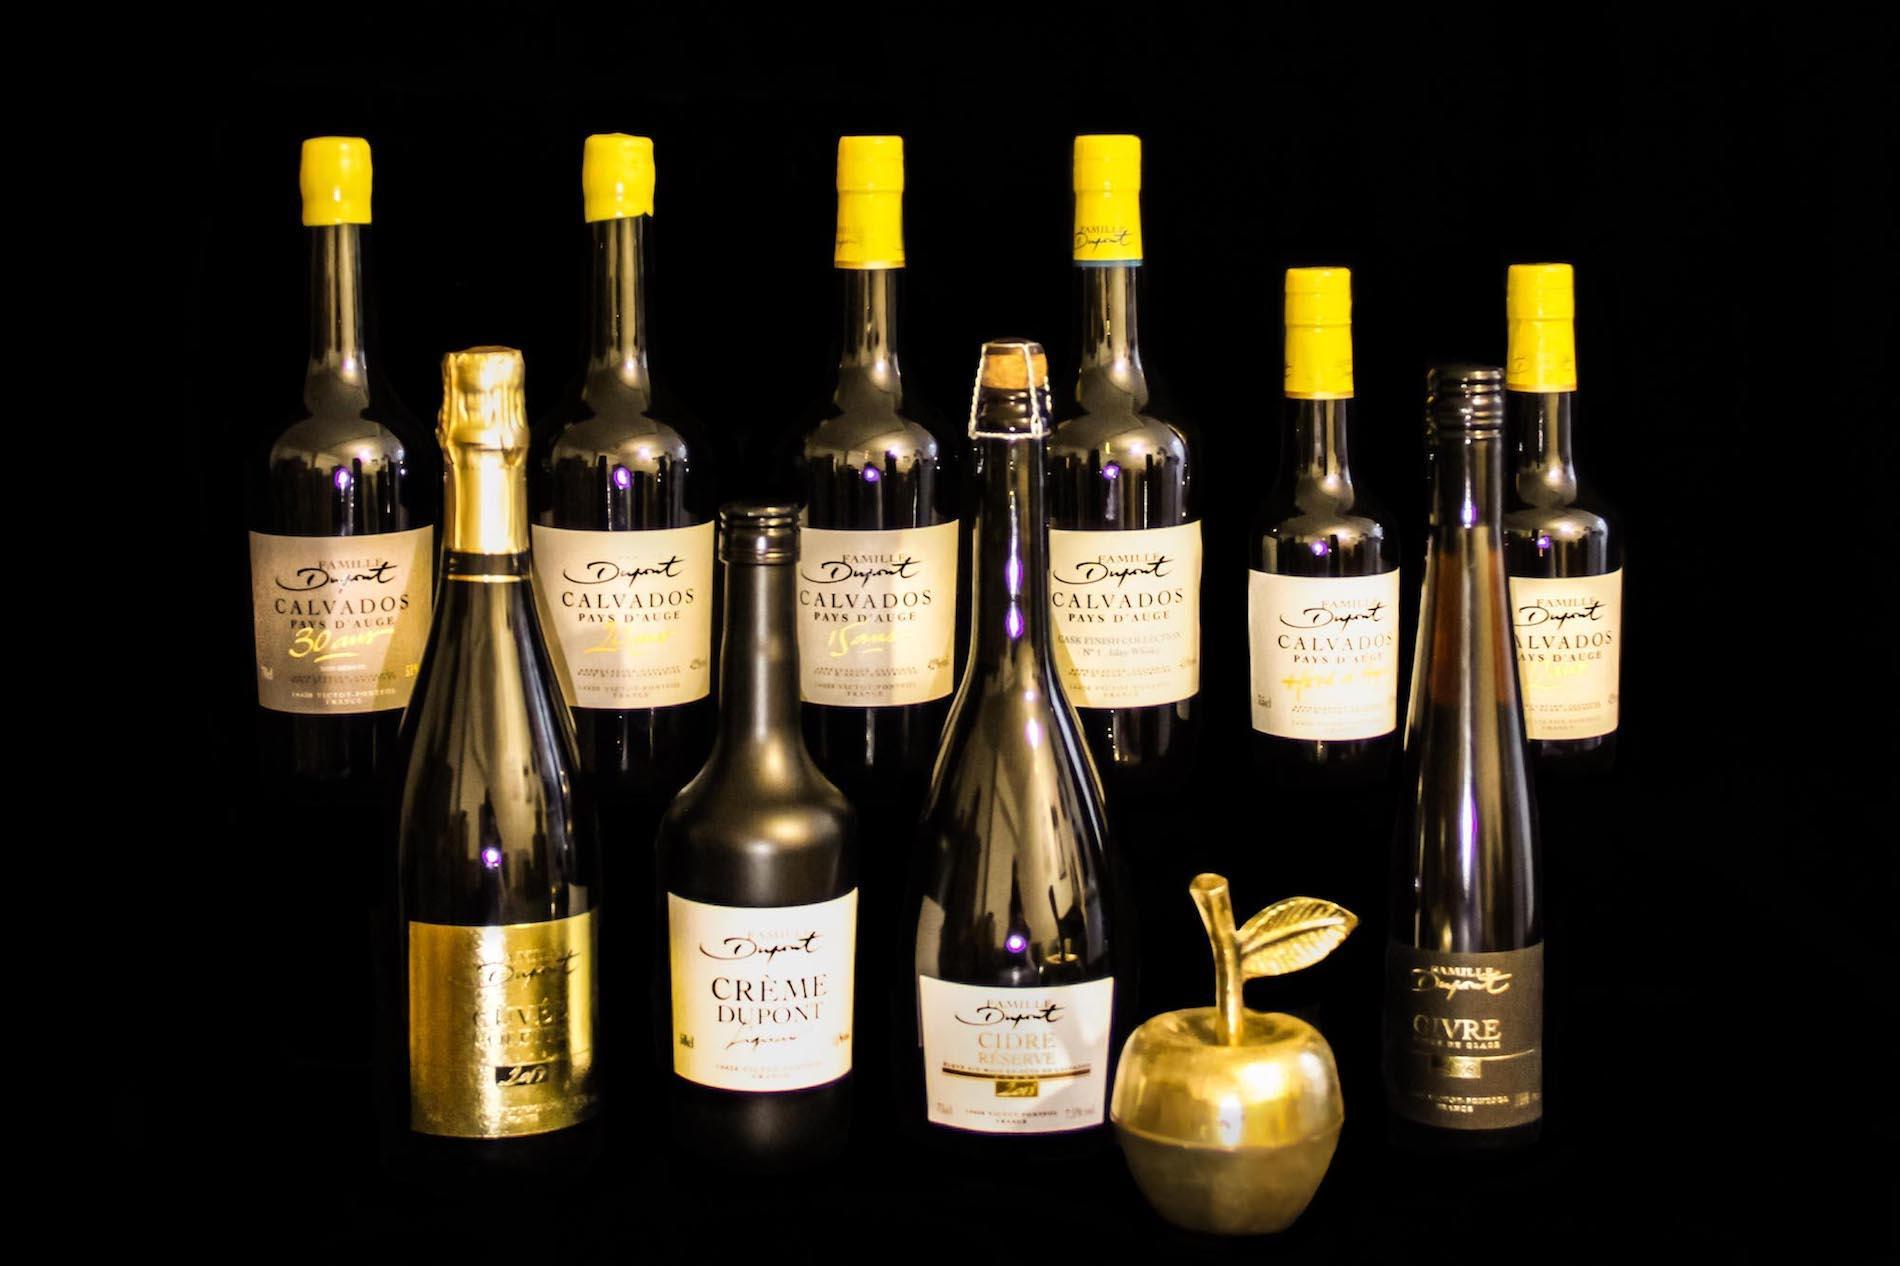 Calvados Pays d'Auge : Dupont